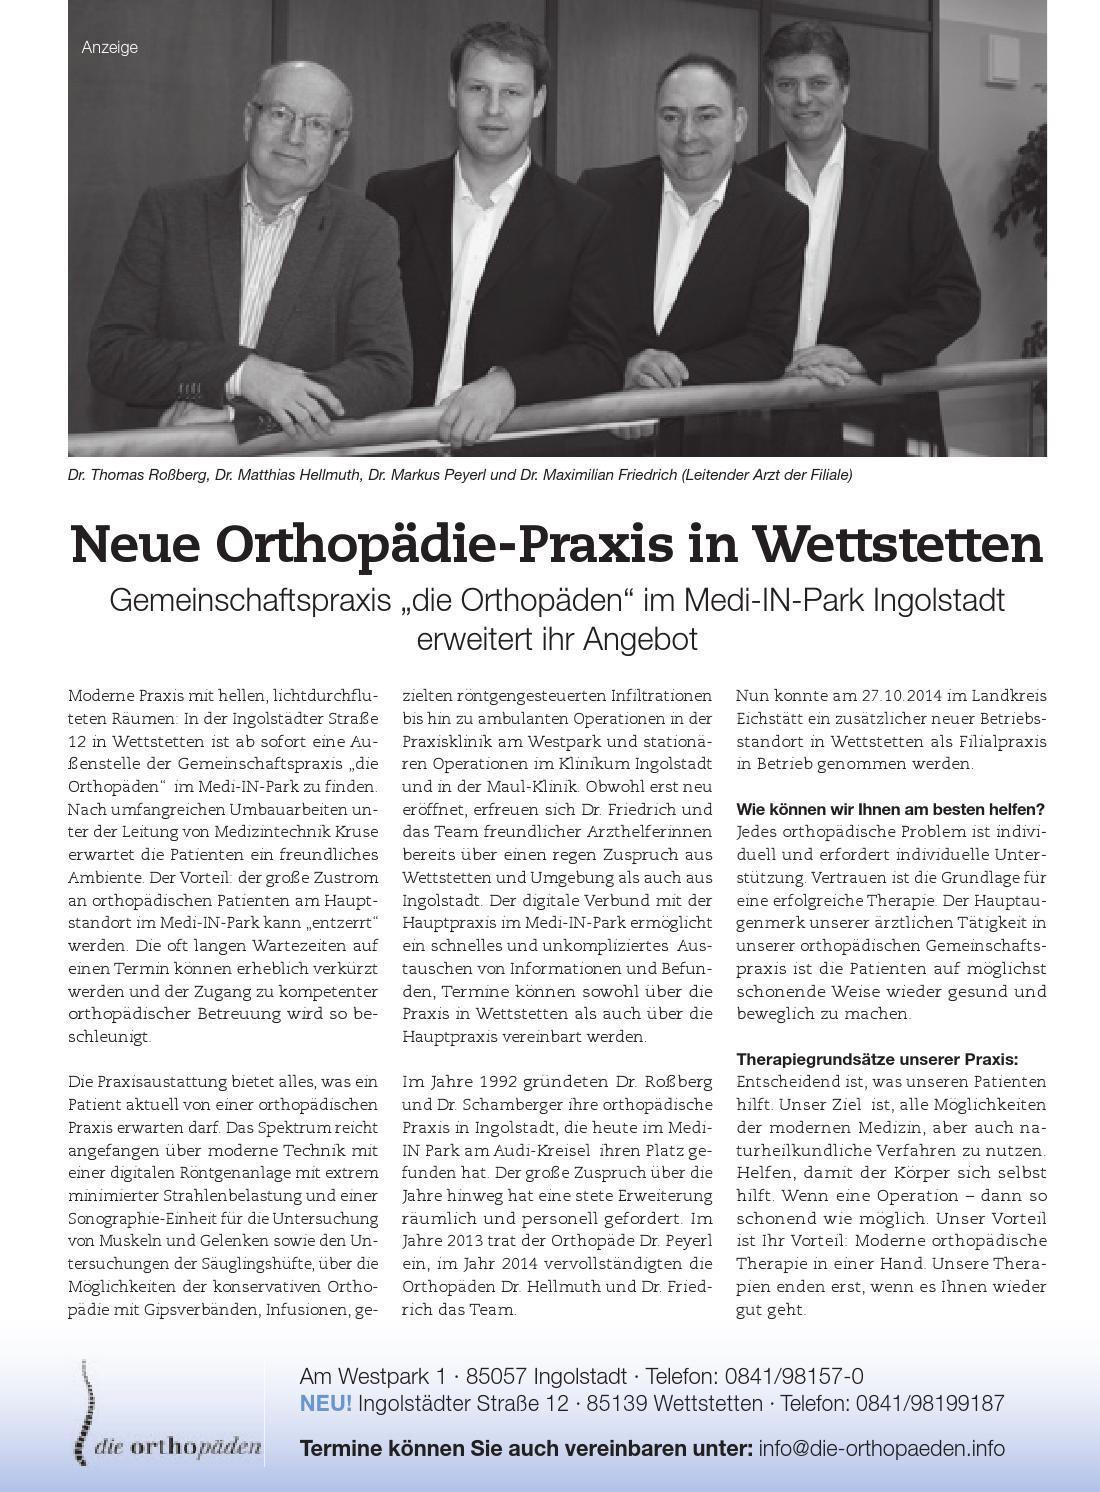 Dr. Friedrich Wettstetten